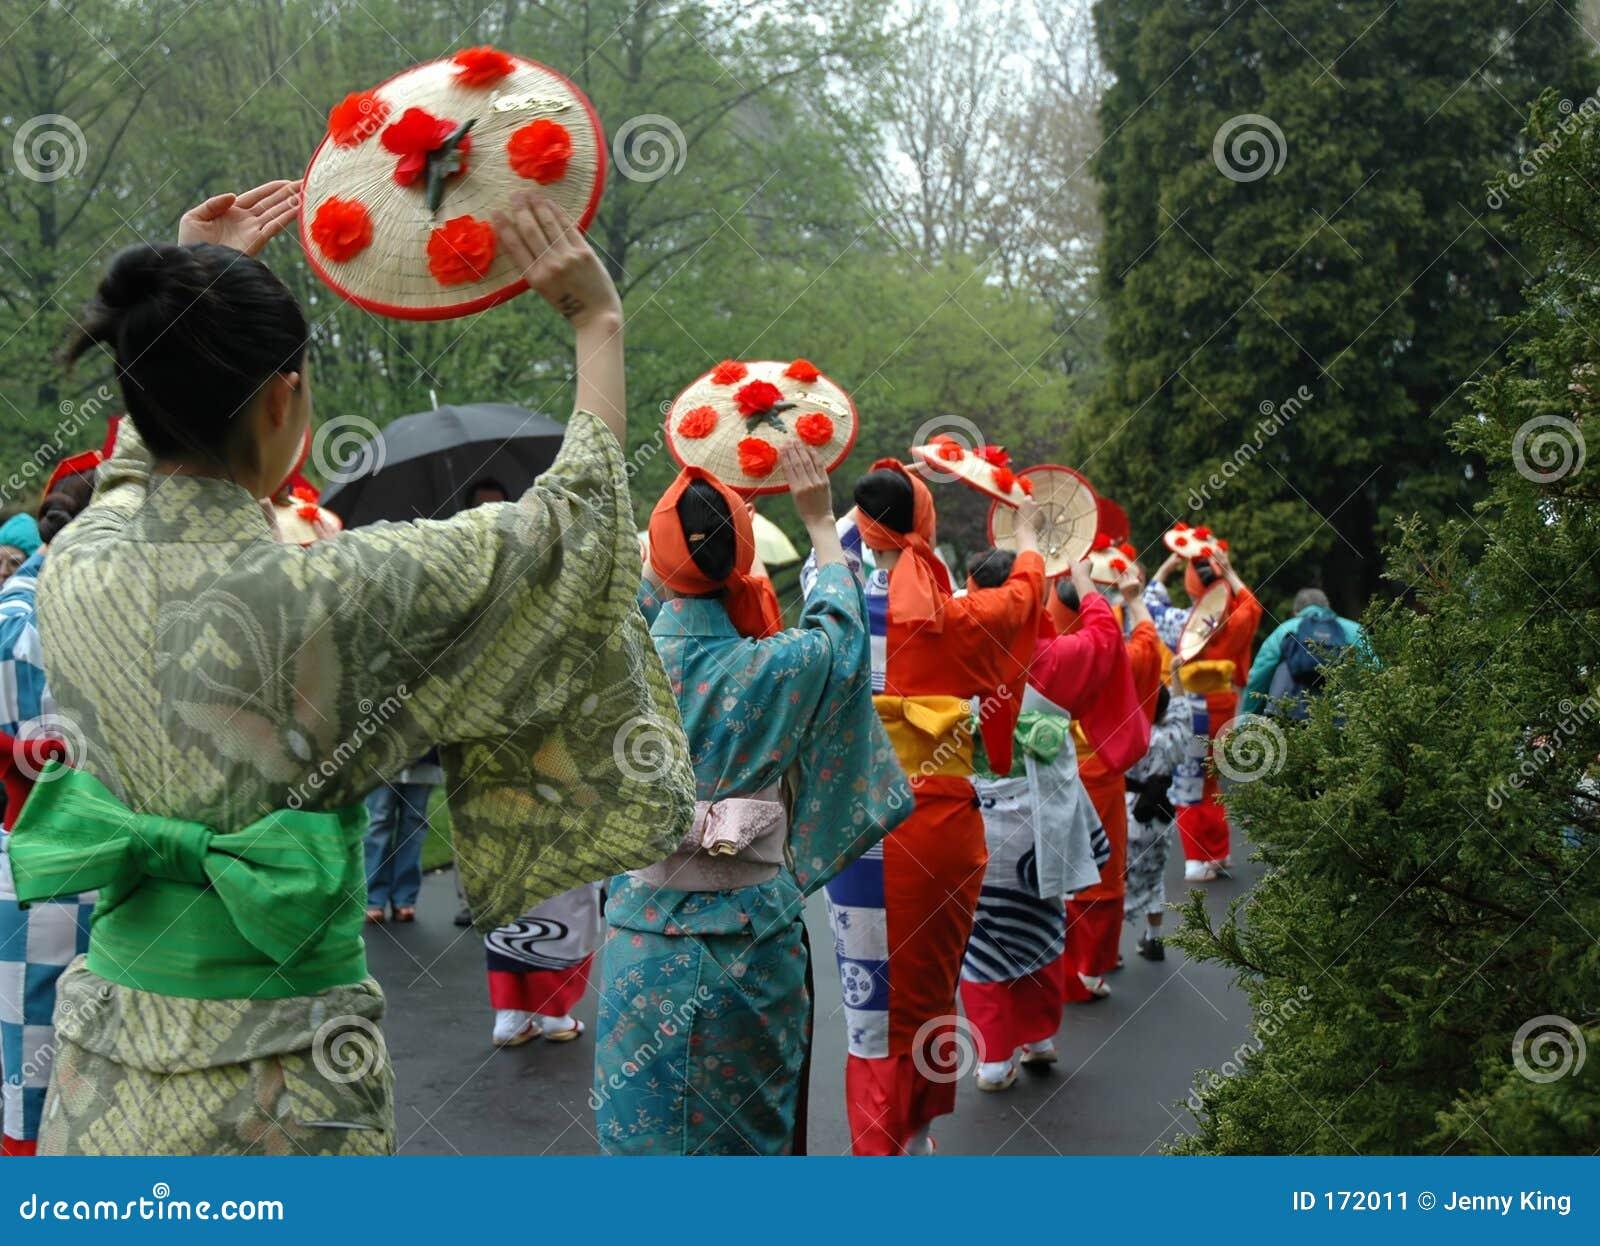 Flower Hat Dance